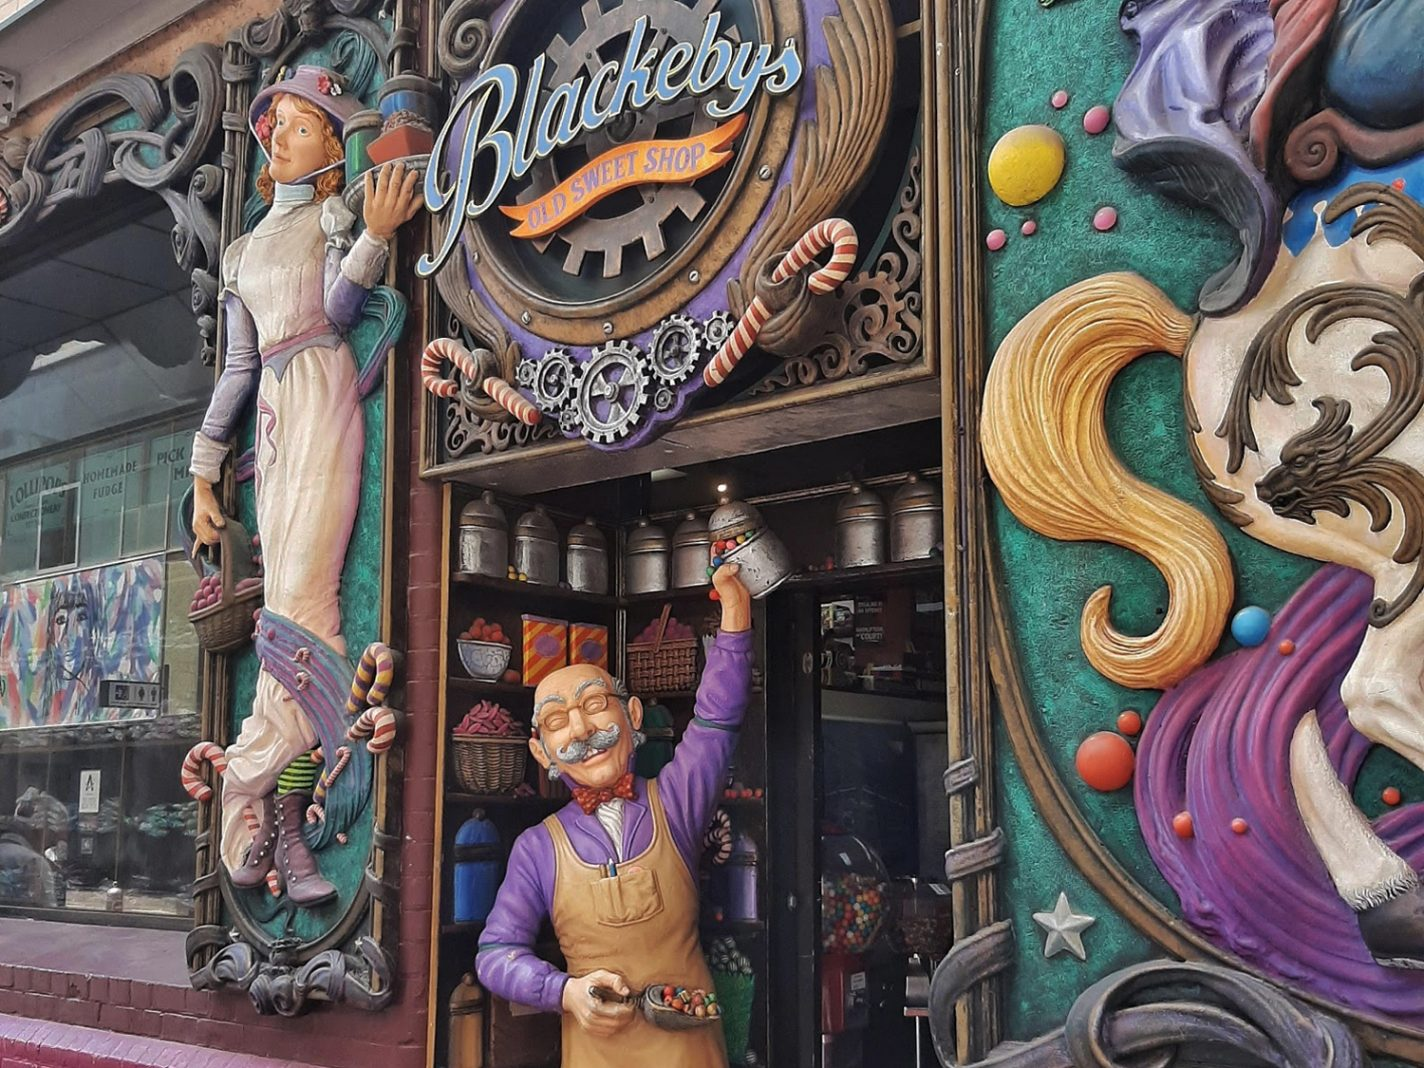 Blackebys - Old Sweet Shop - Bezienswaardigheden Adelaide